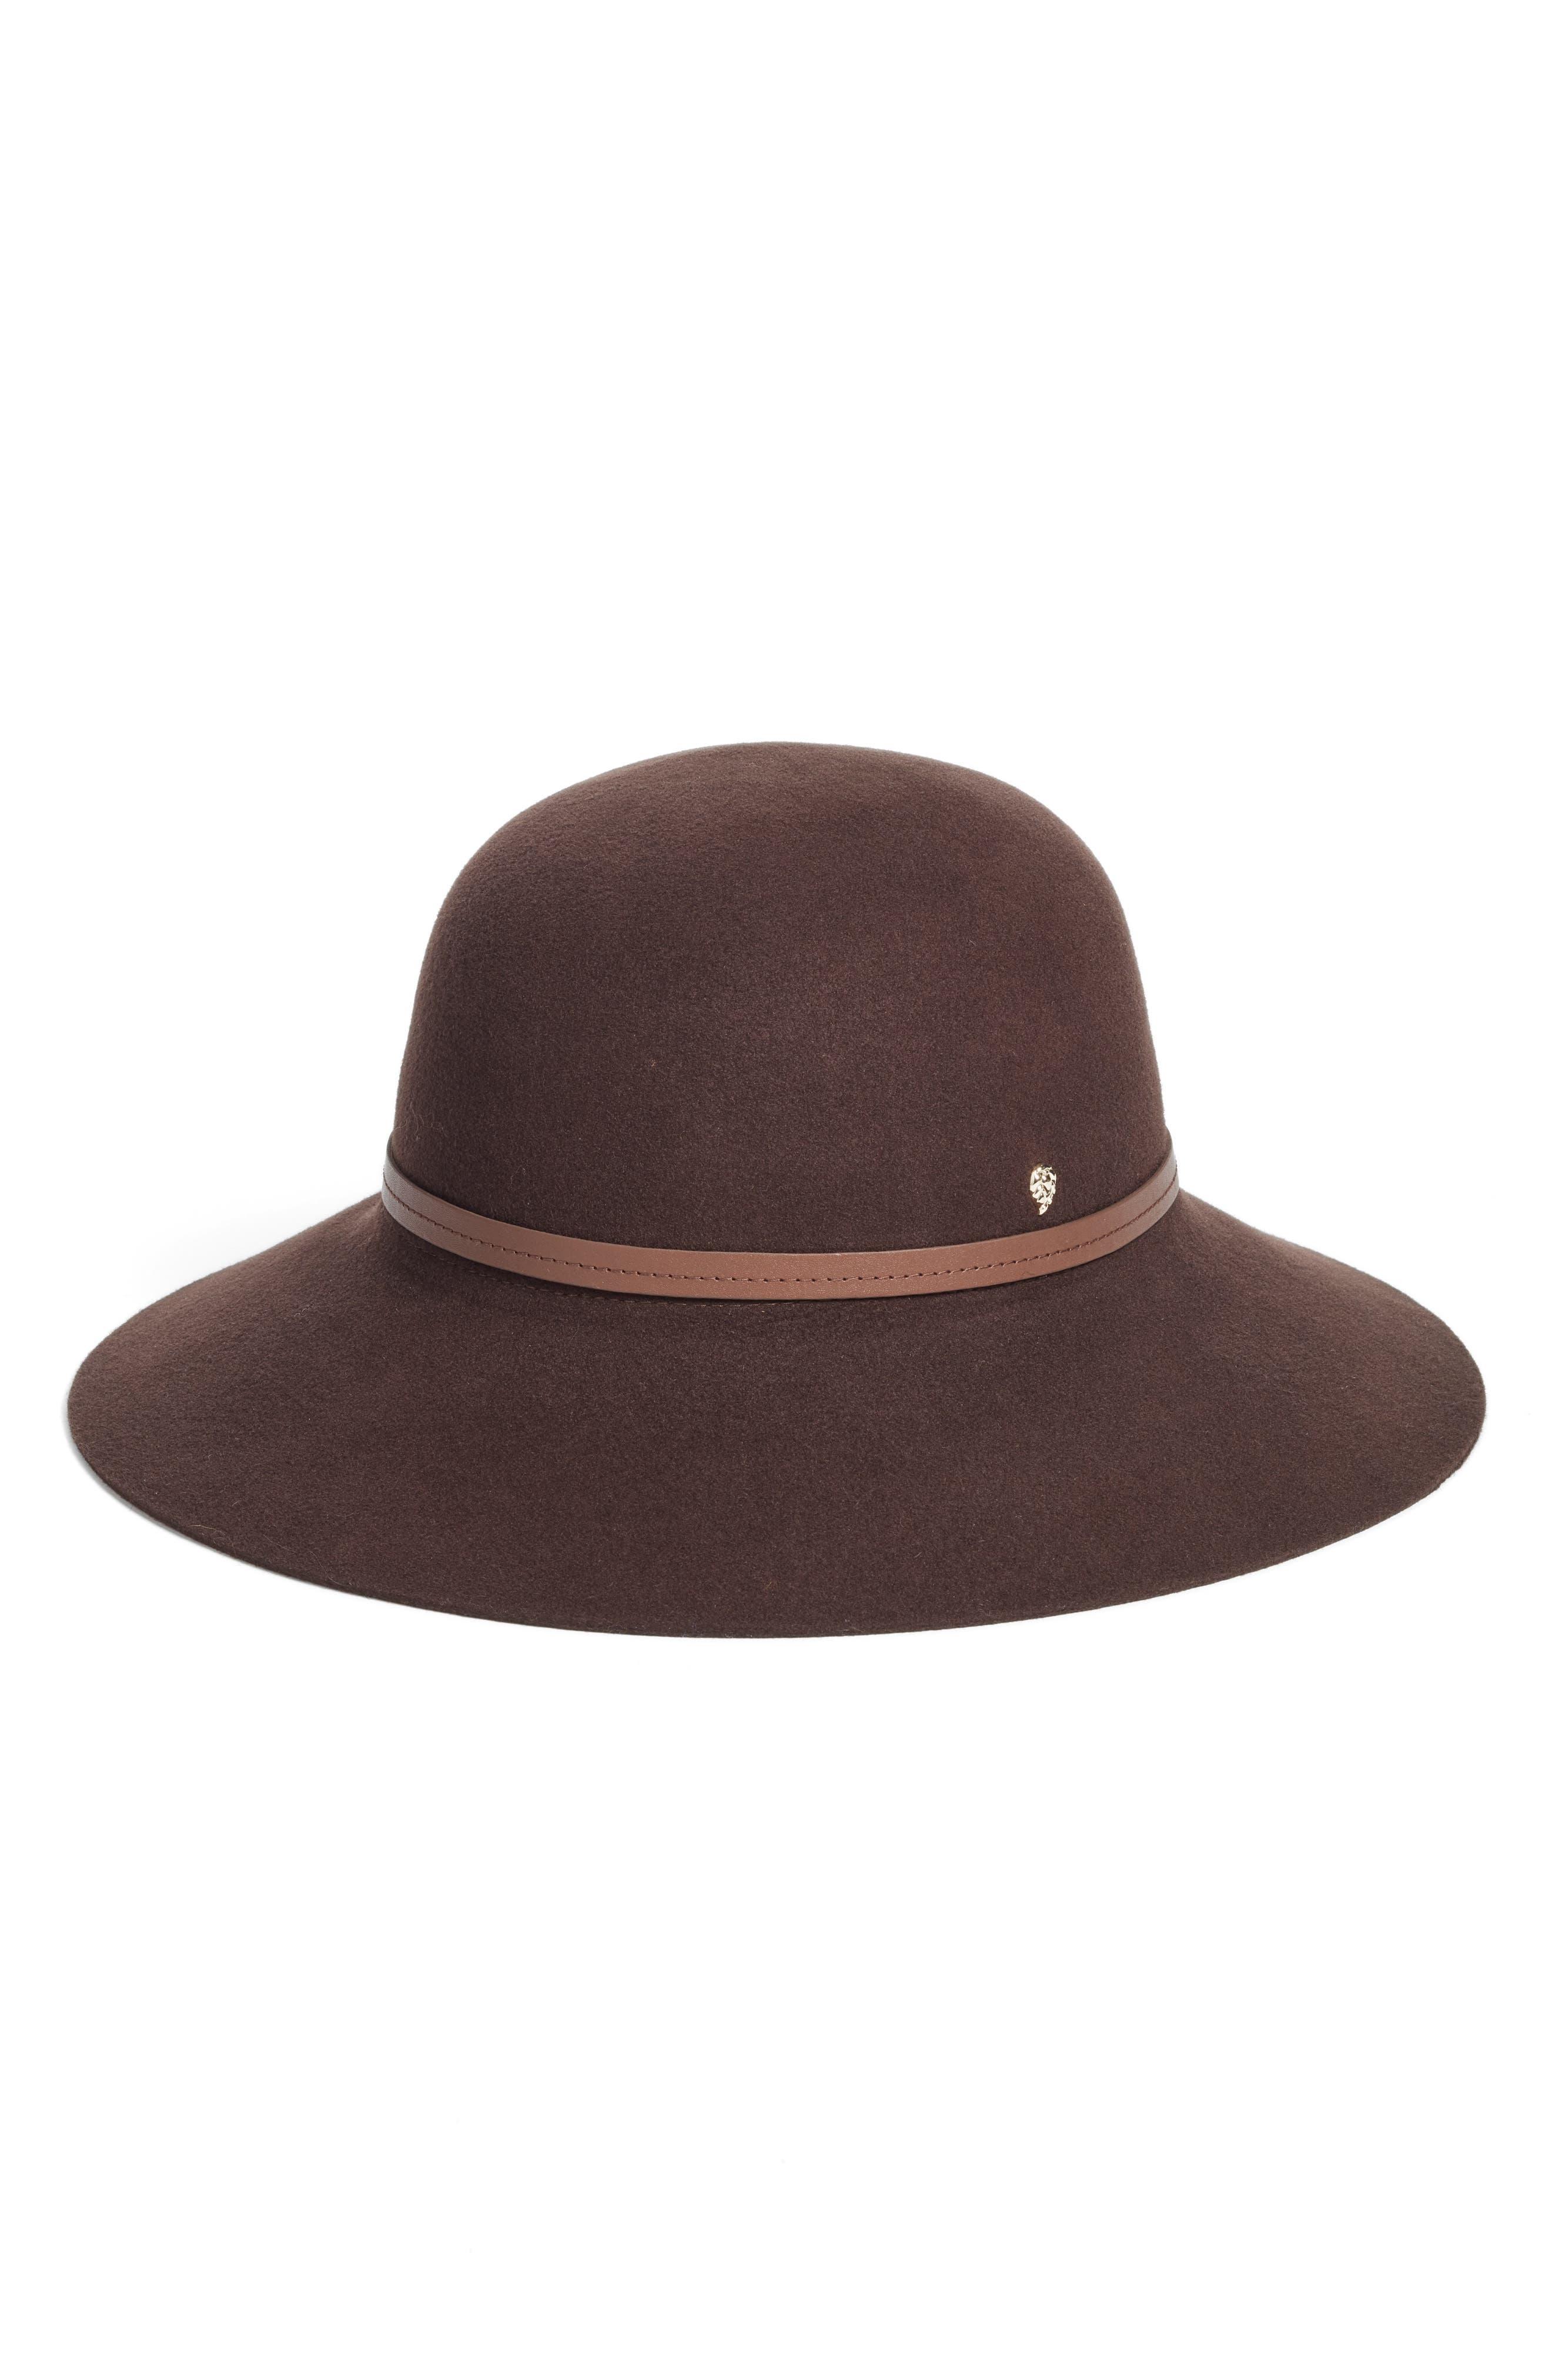 Alternate Image 1 Selected - Helen Kaminski Angled Brim Wool Felt Hat